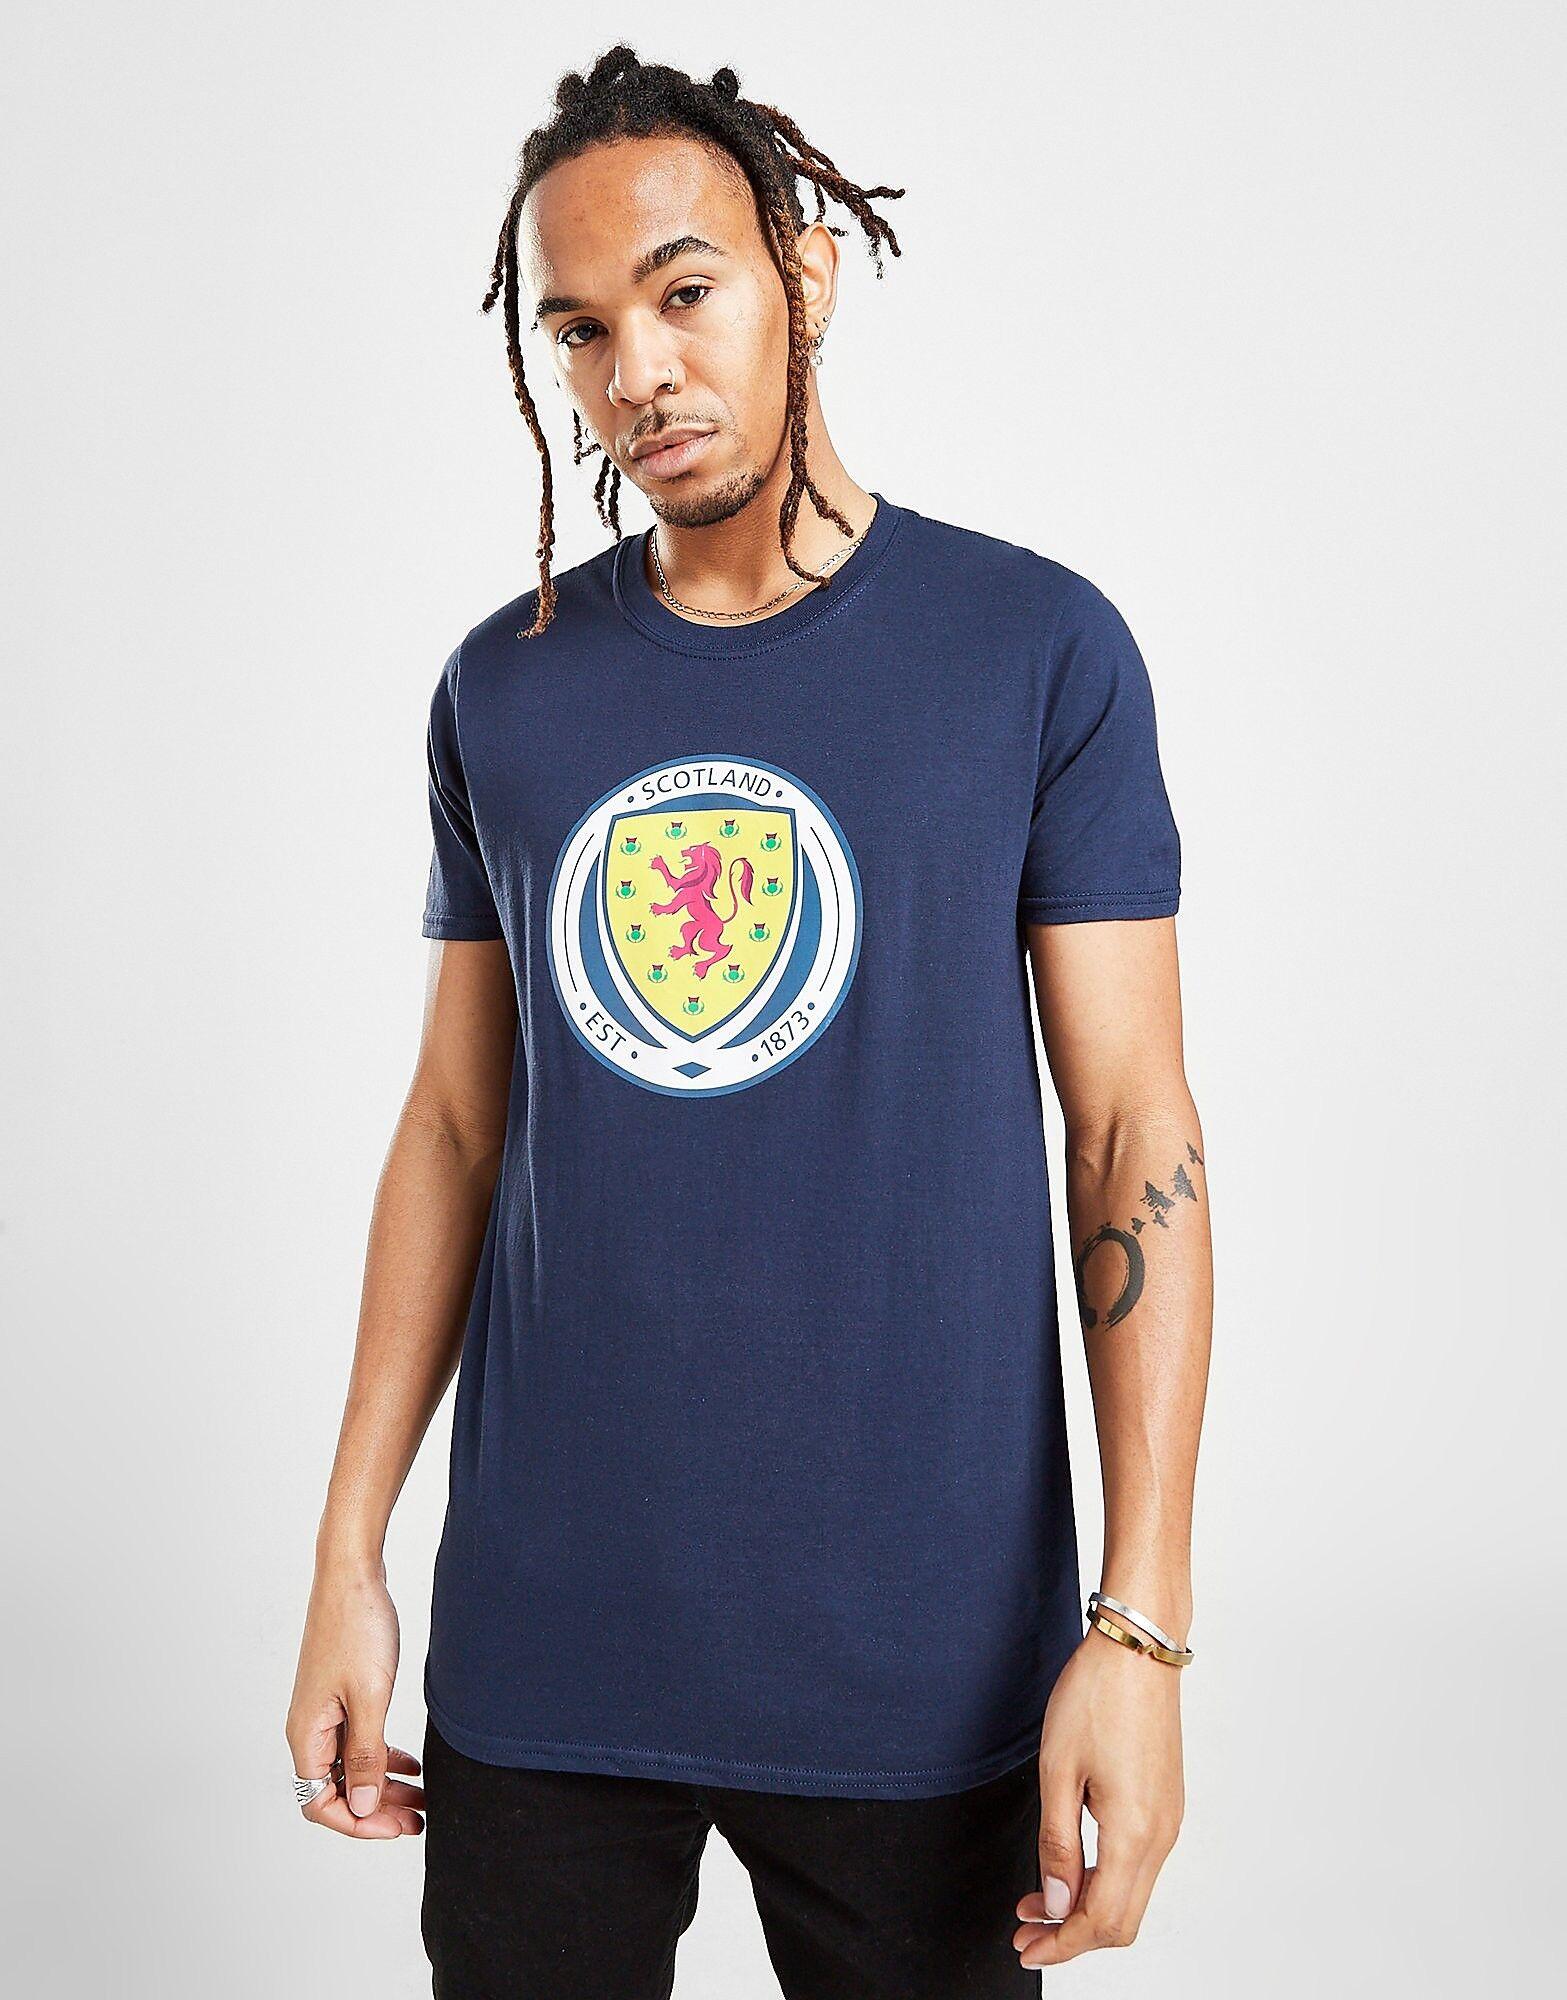 Official Team Scotland FA Crest -T-paita Miehet - Mens, Laivastonsininen